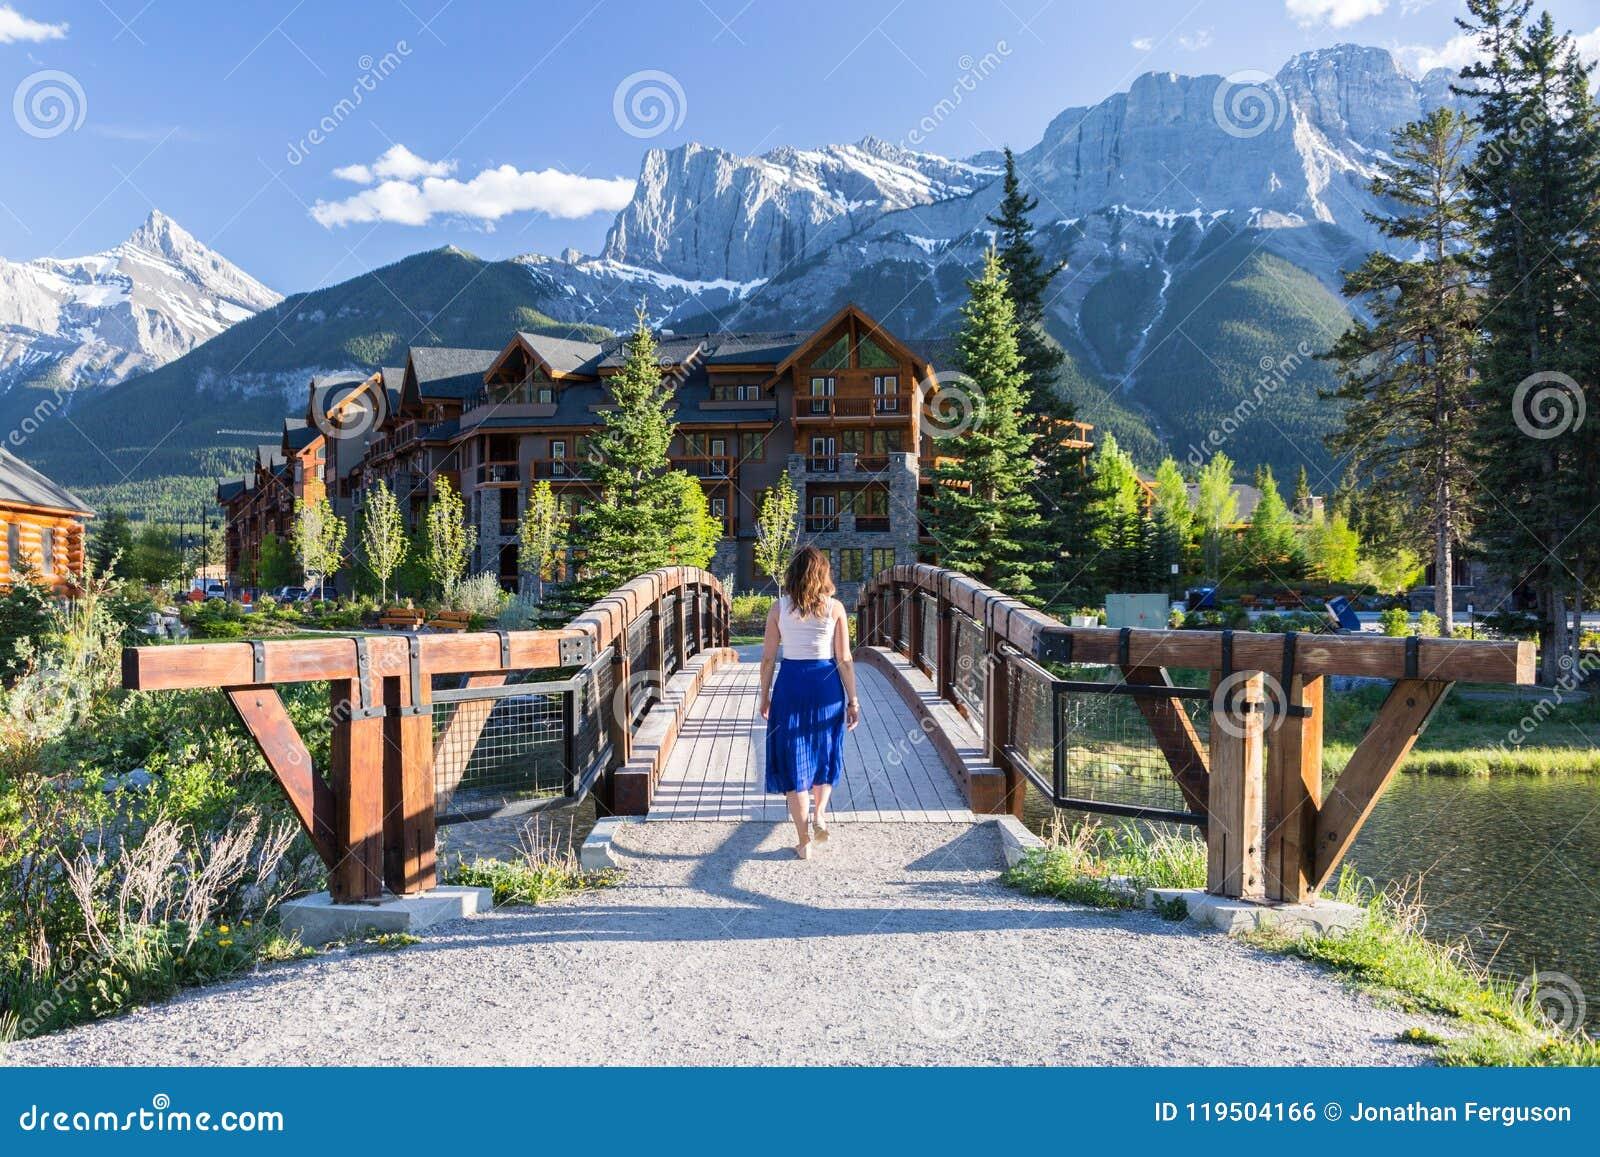 mountain retreat chalet stock photo. image of woman - 119504166